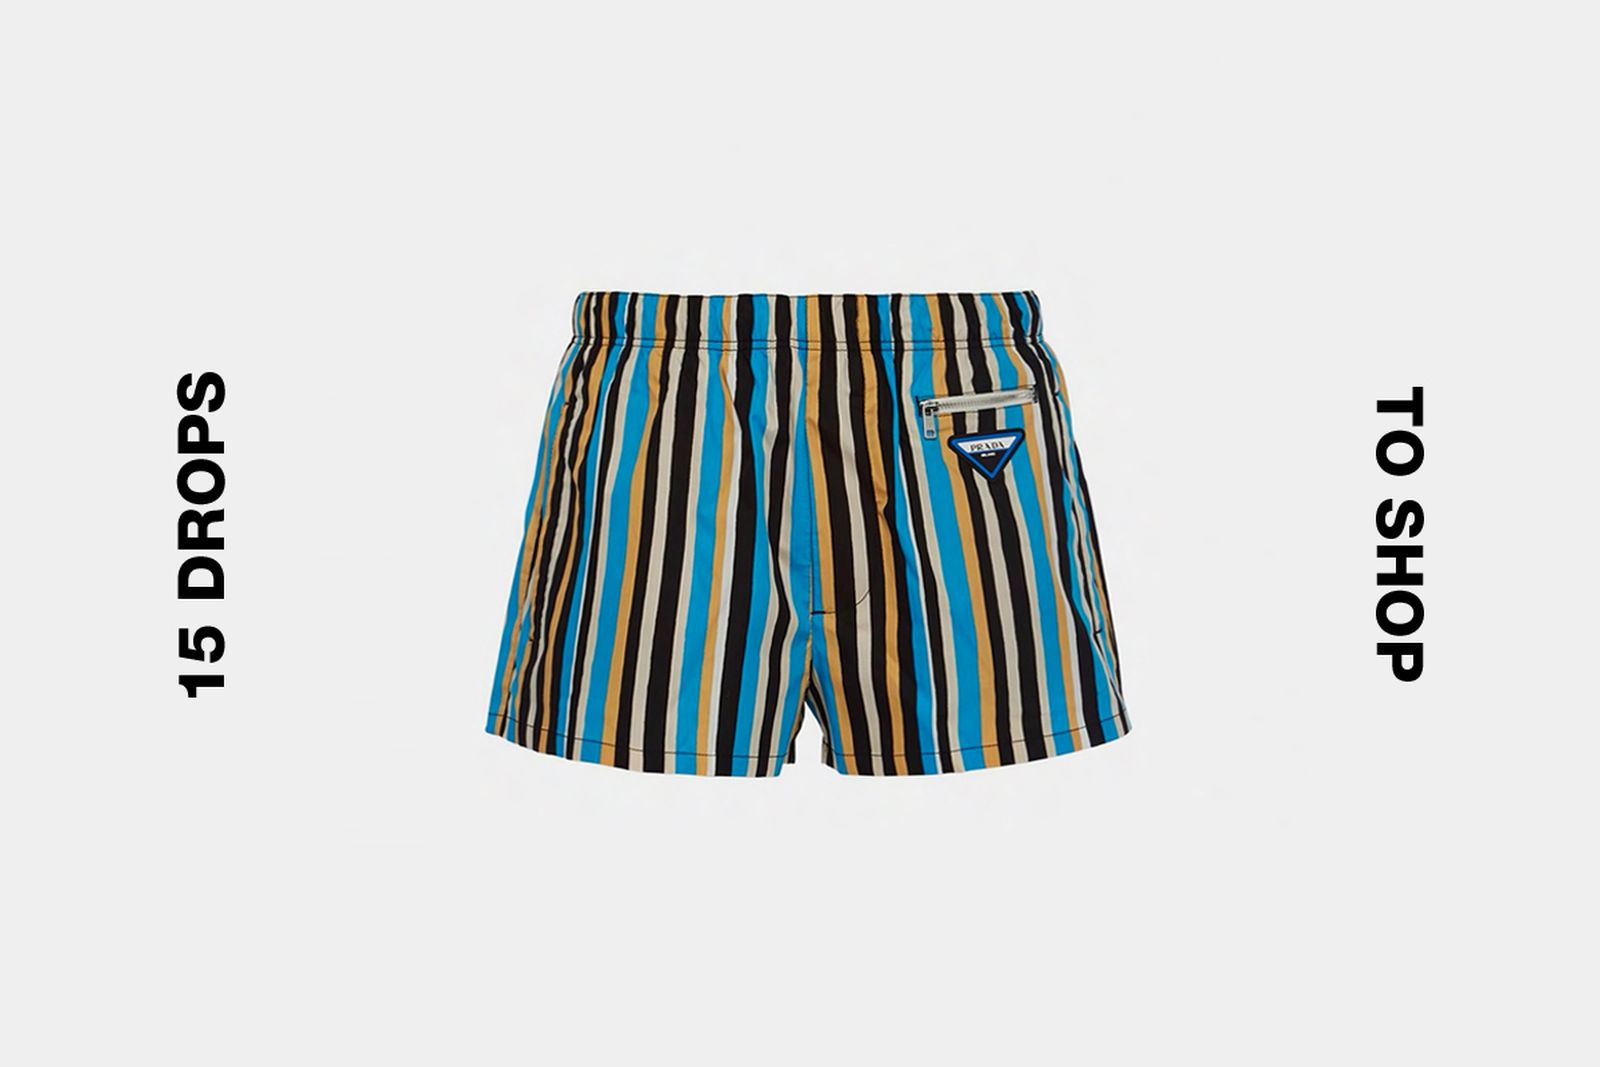 prada swim shorts best drops buy 1017 ALYX 9SM Apple Air Pods Eytys Angel Stash